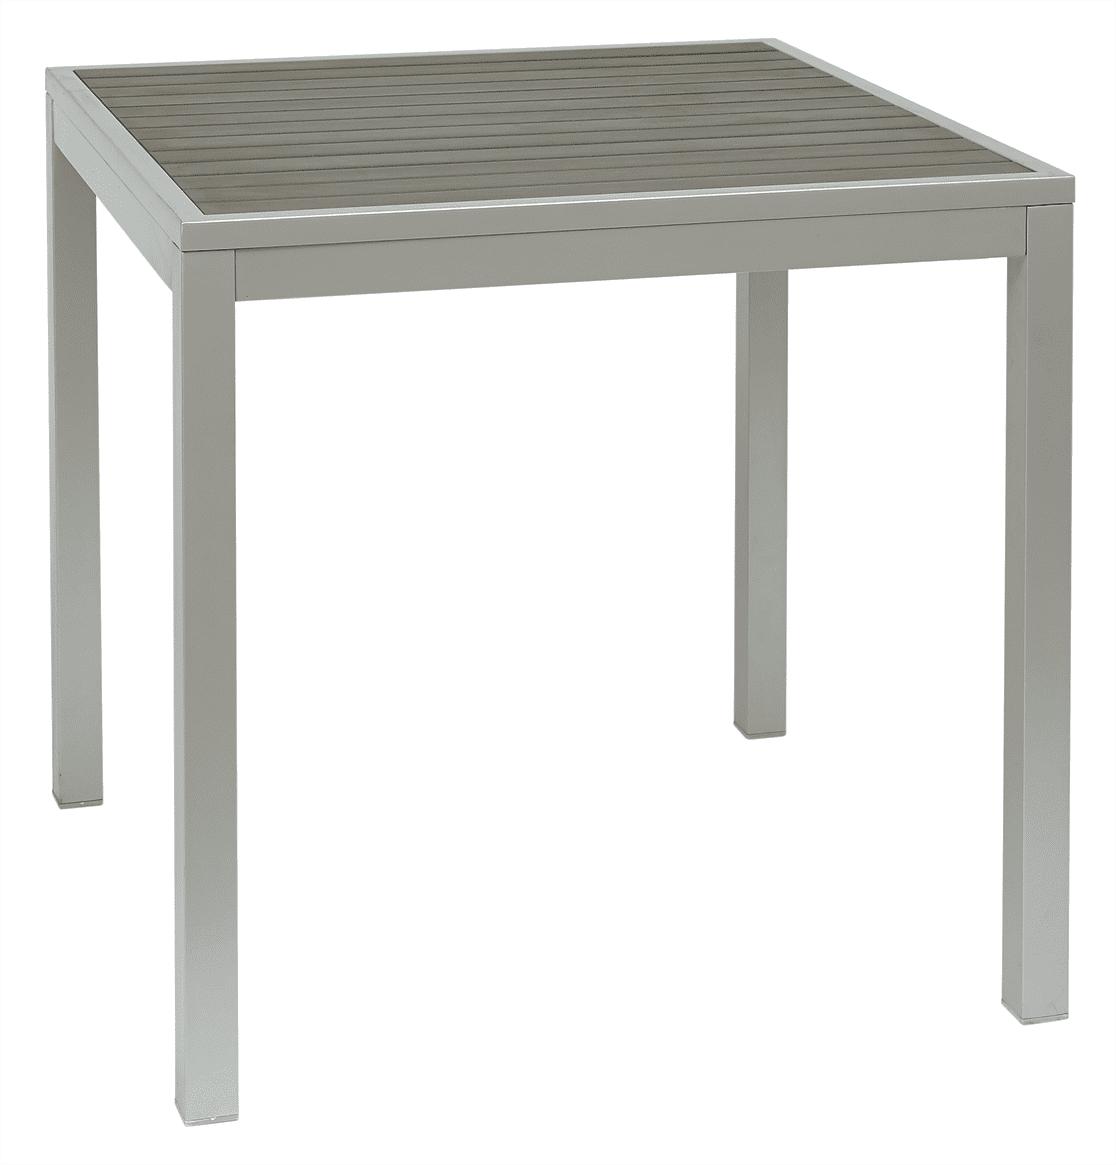 BREW EZICARE SQ TABLE 750mm